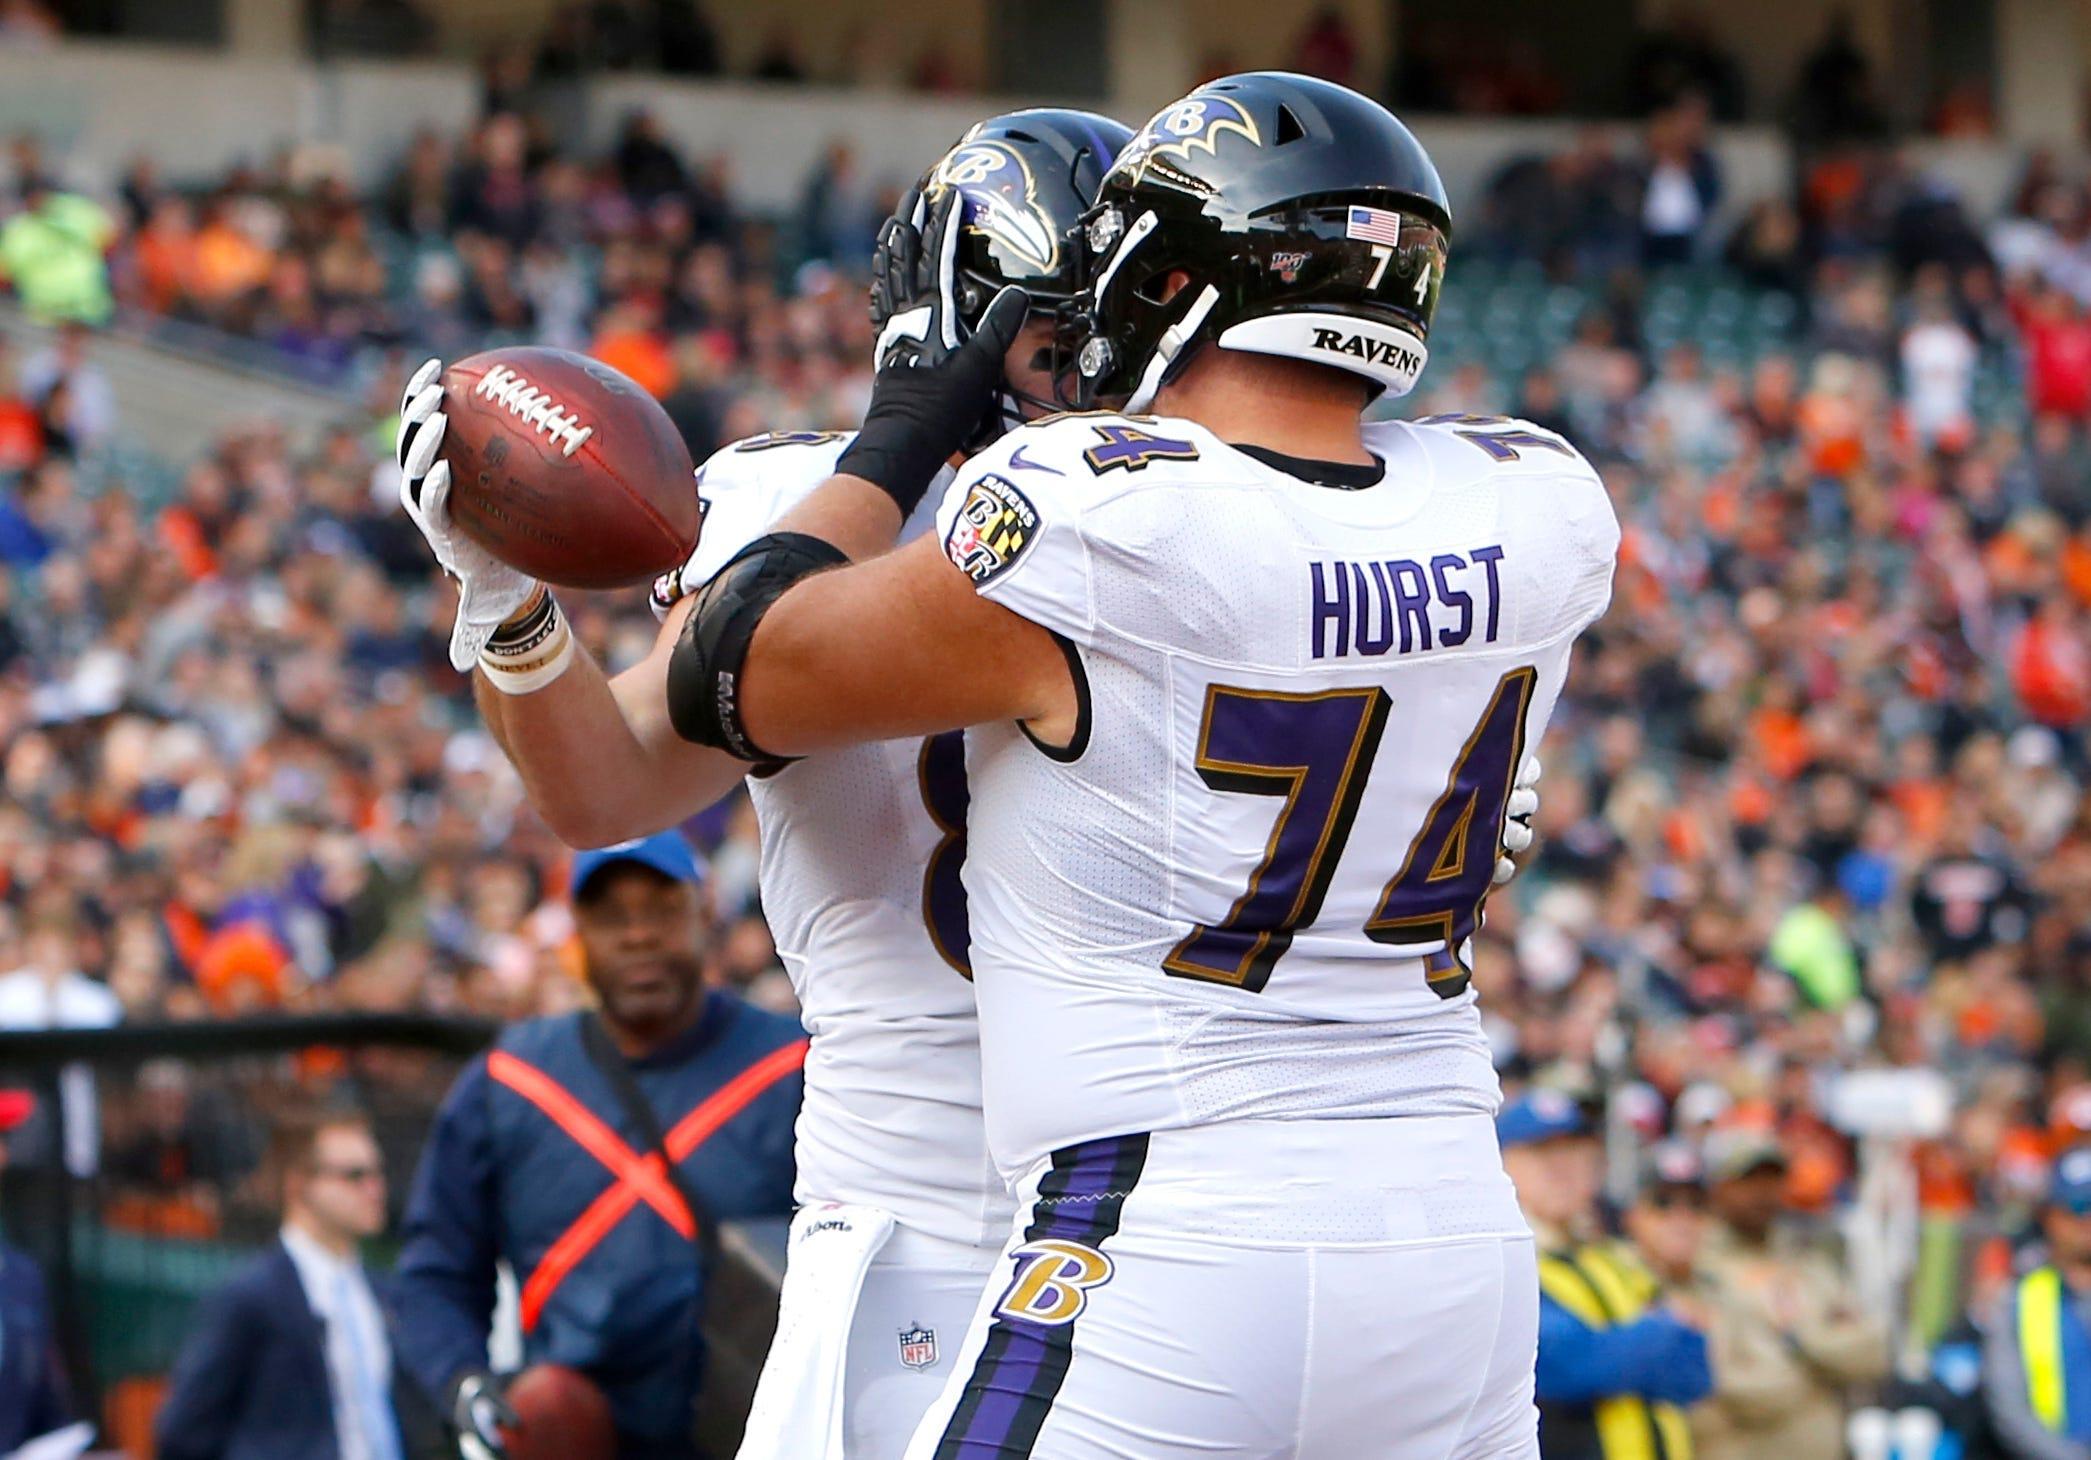 James Hurst NFL Jersey